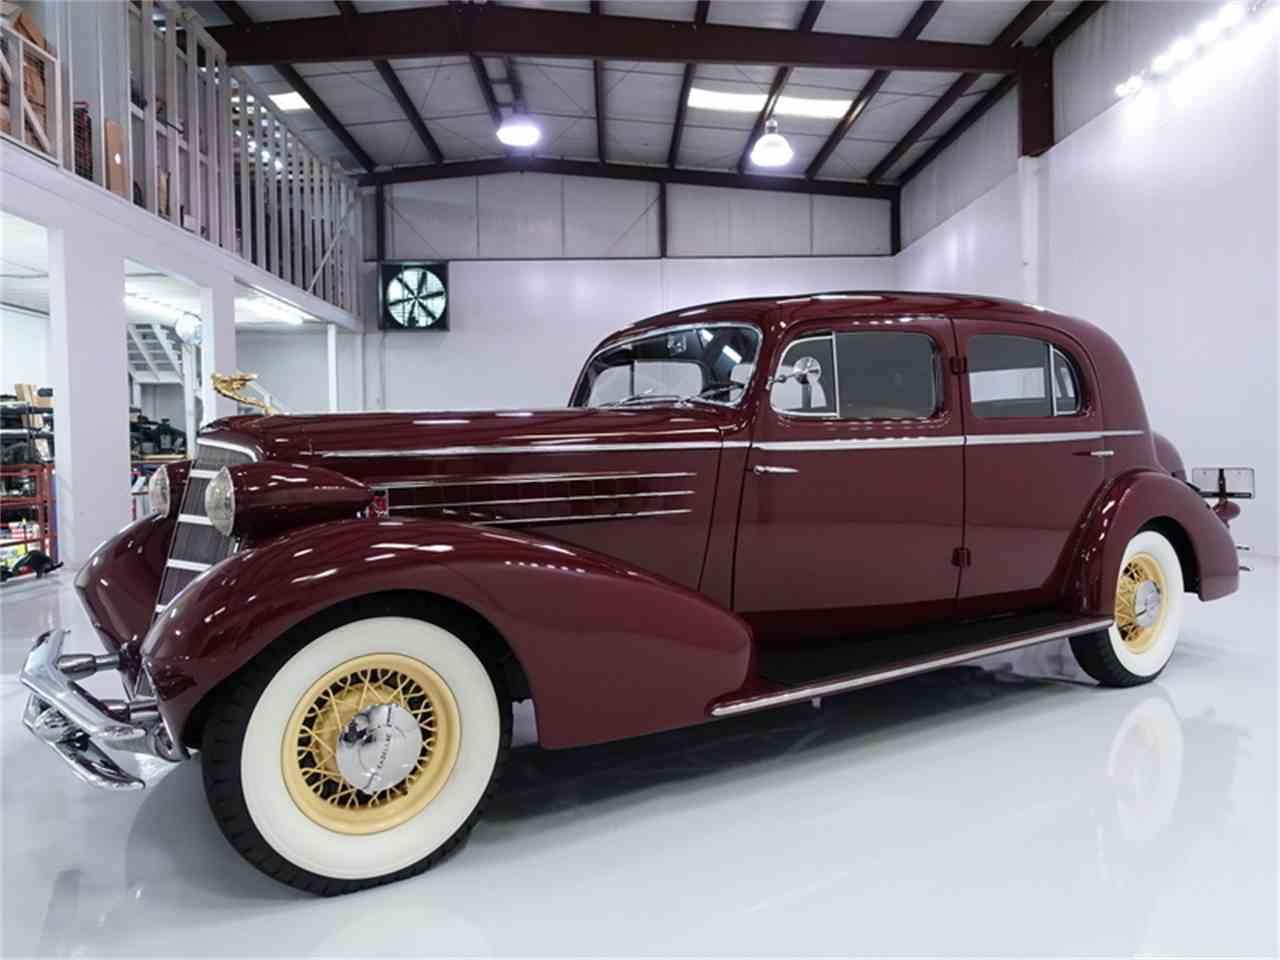 1934 Cadillac Town Sedan For Sale Classiccars Com Cc